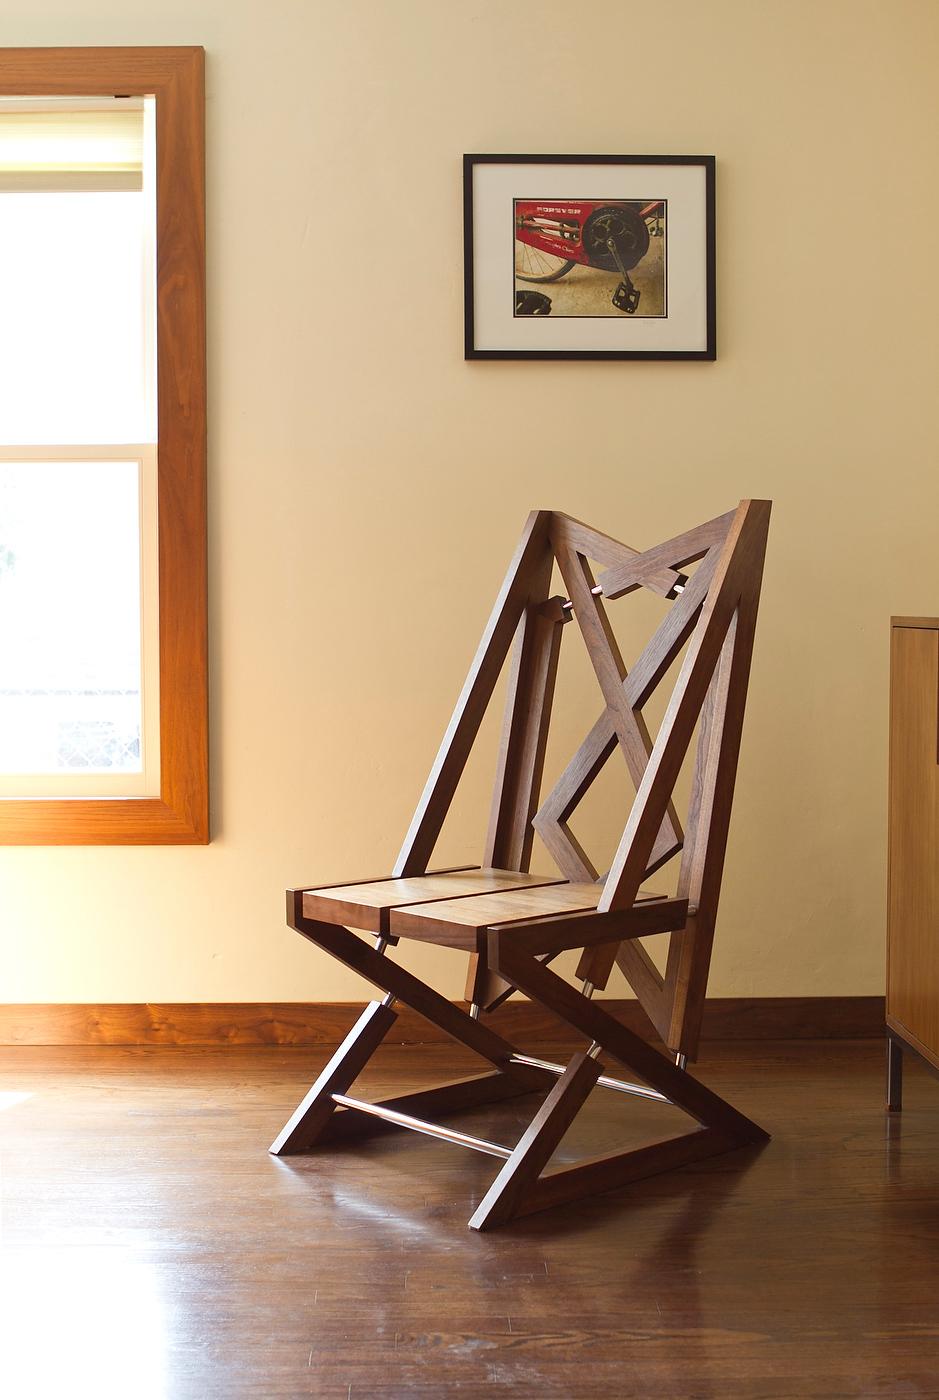 furniture-chair-thing-02.jpg